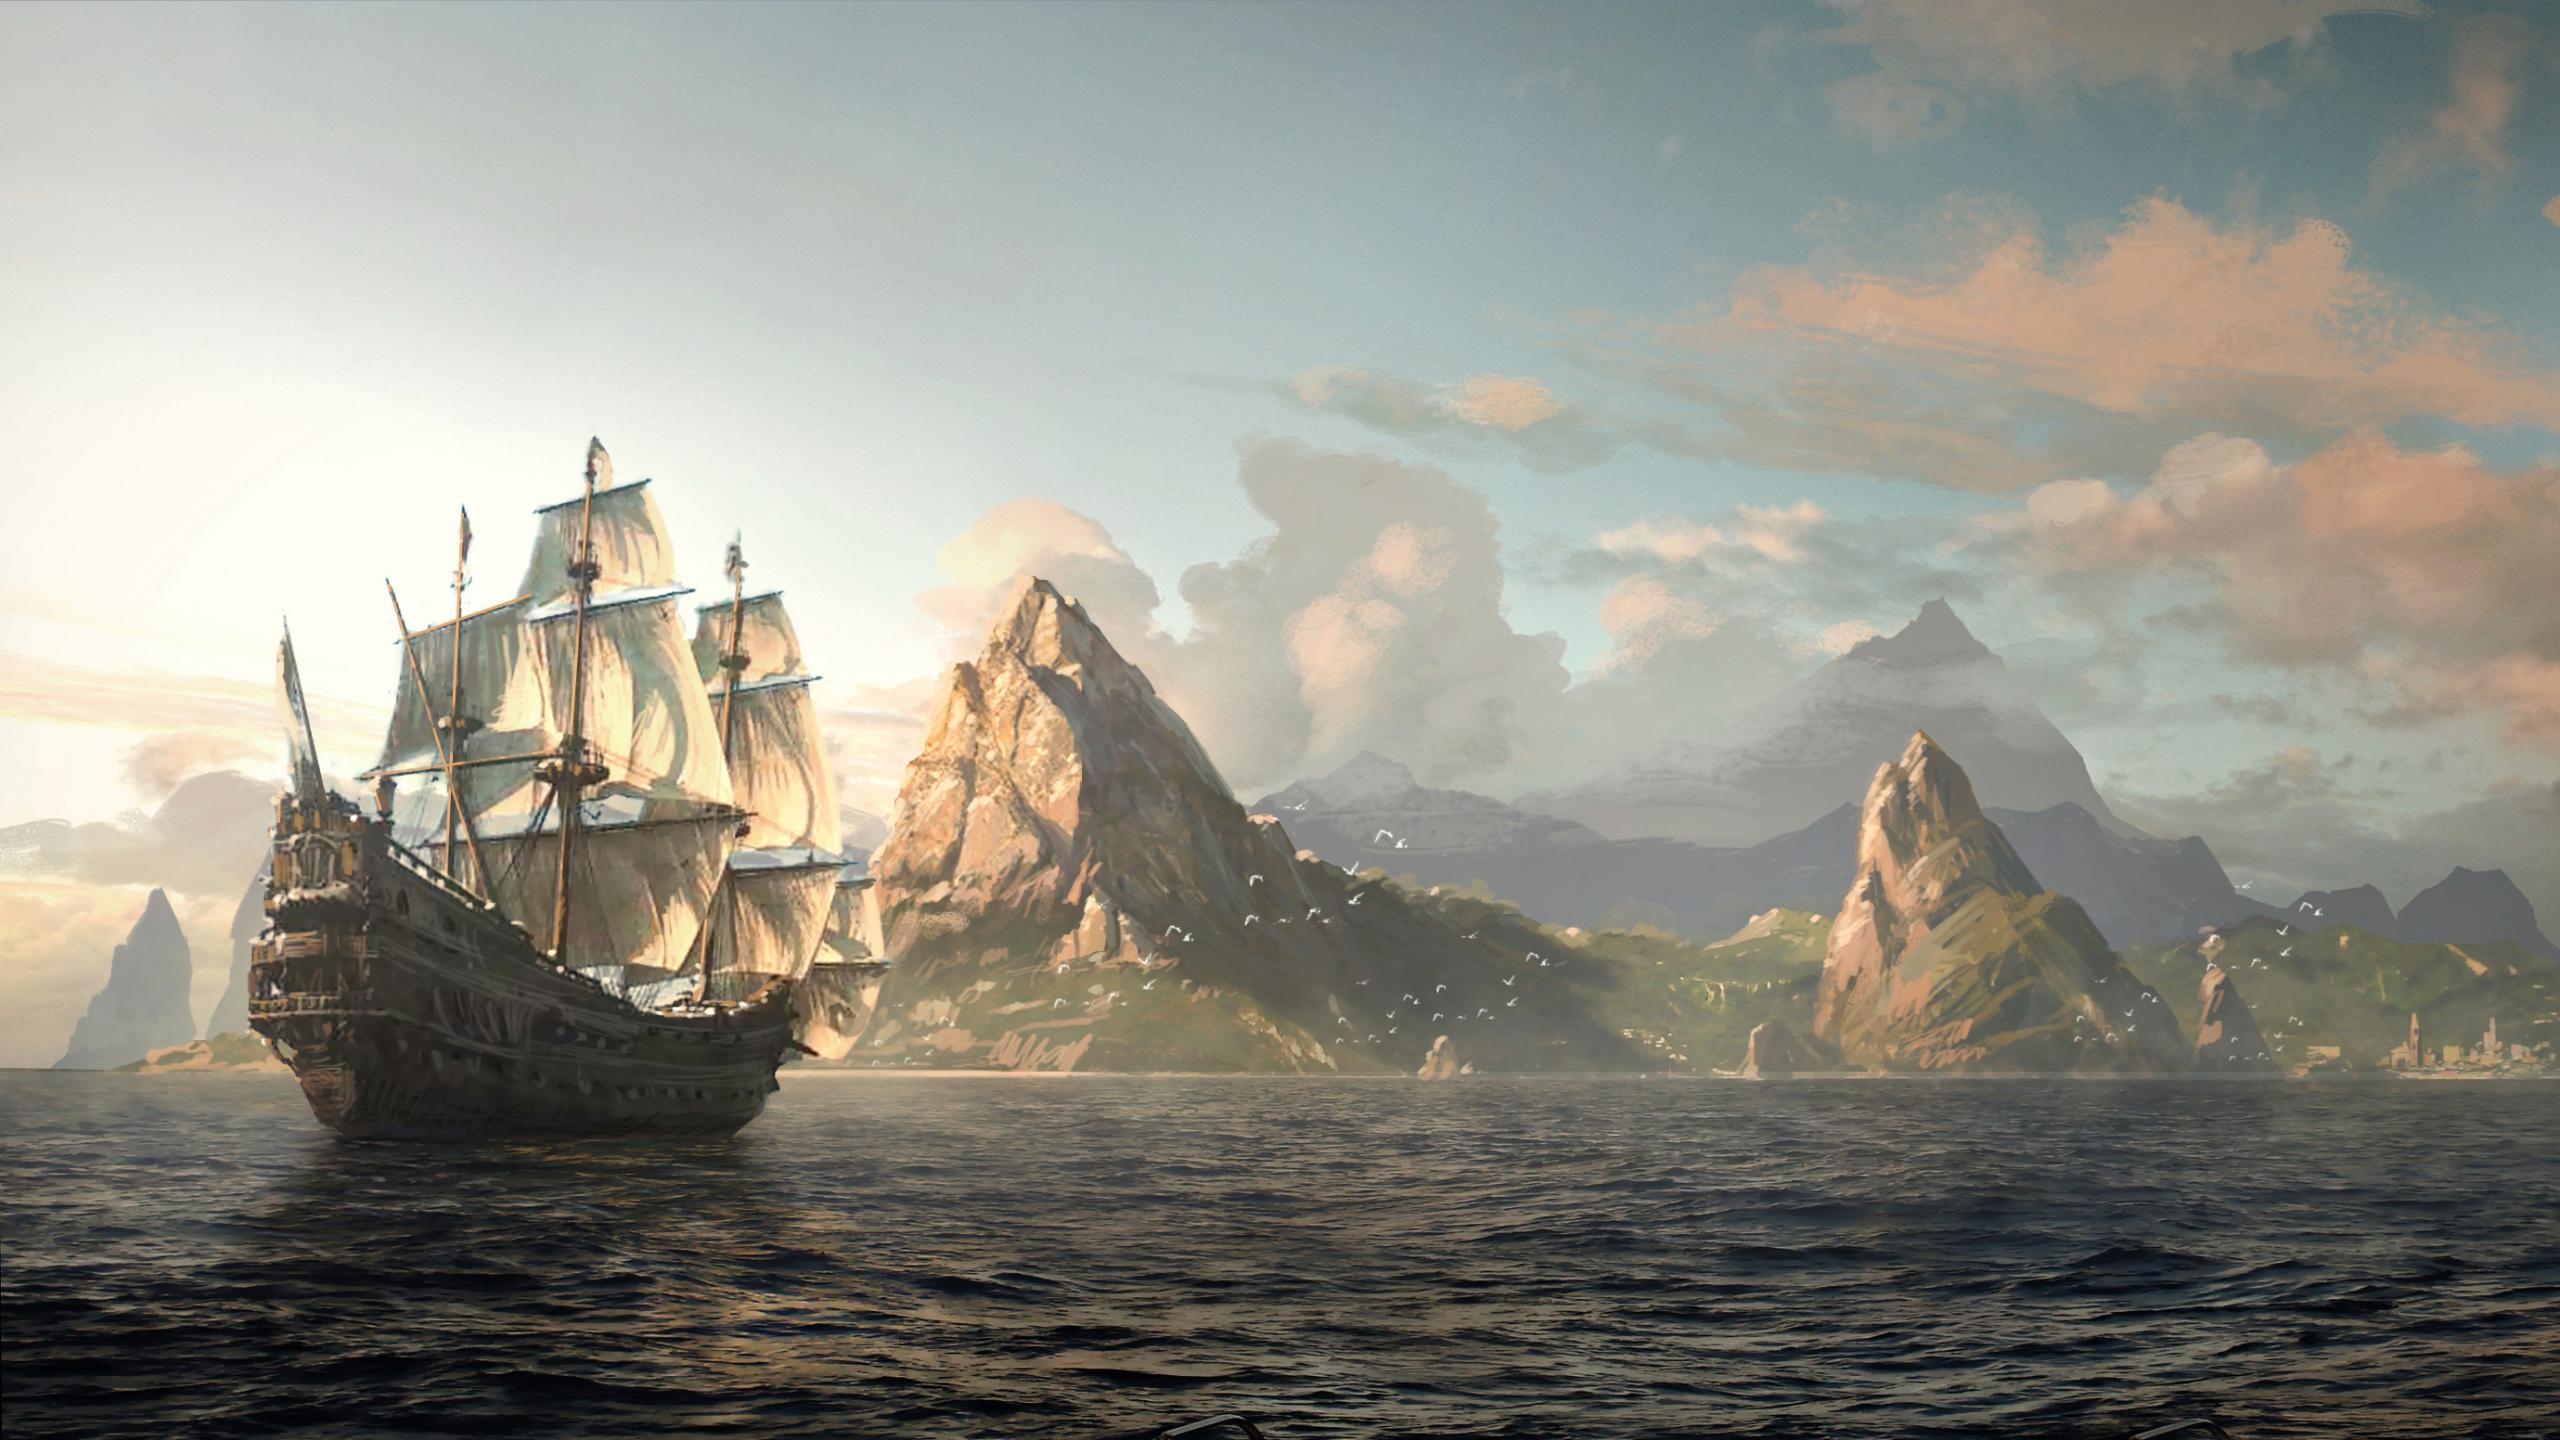 Assassins creed iv black flag assassin pirate edward kenway 95415 2560x1440